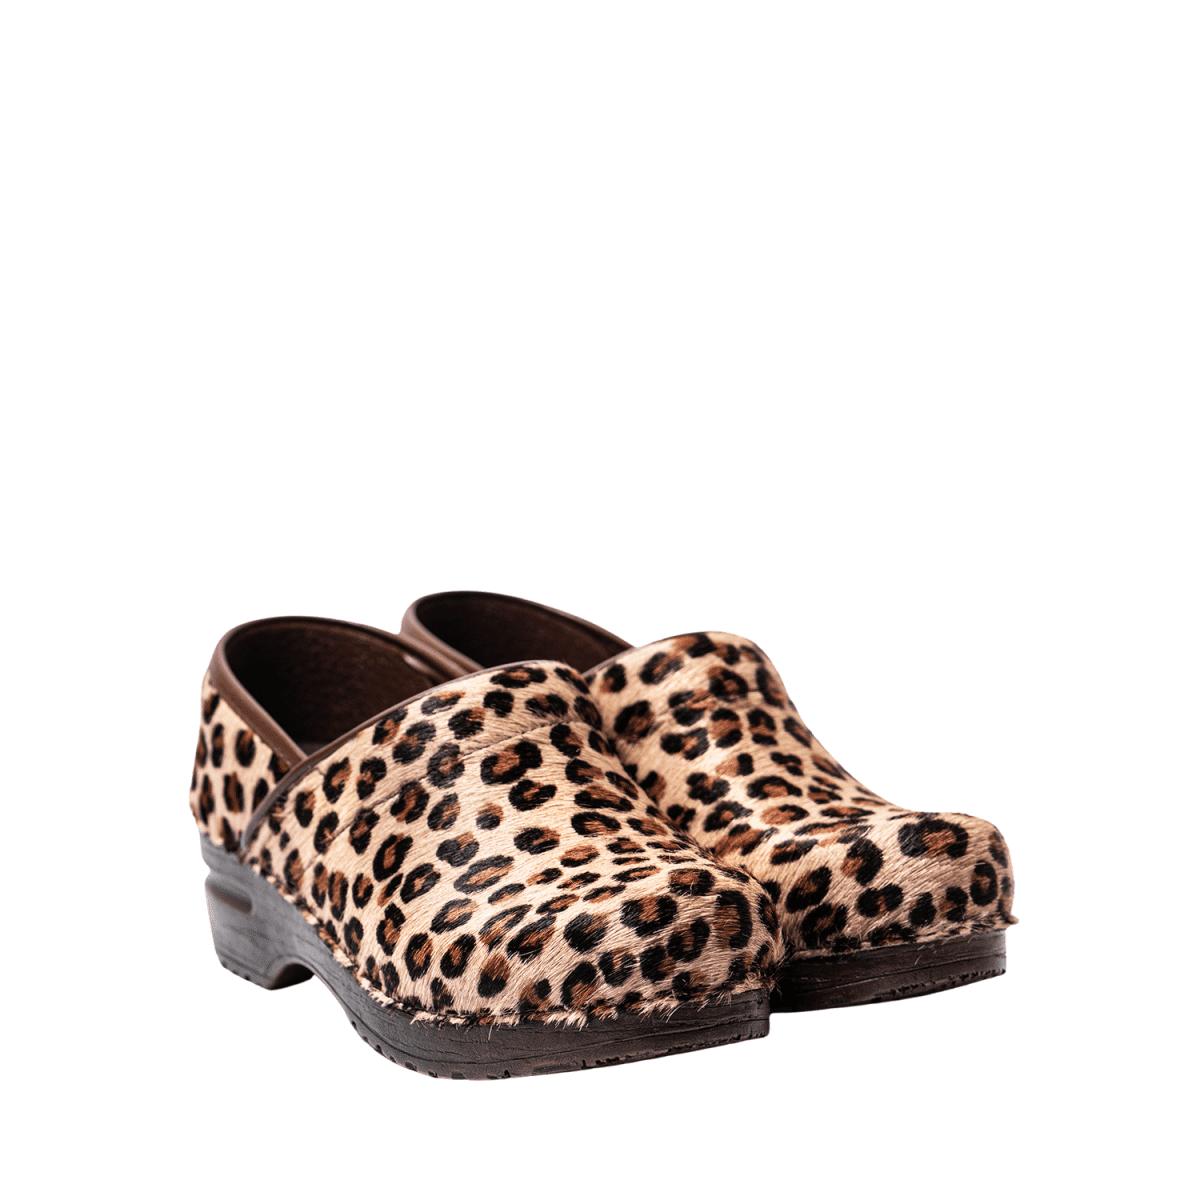 Sanita Zoccolo Original - Prof. Fur Fur Leopard - 38